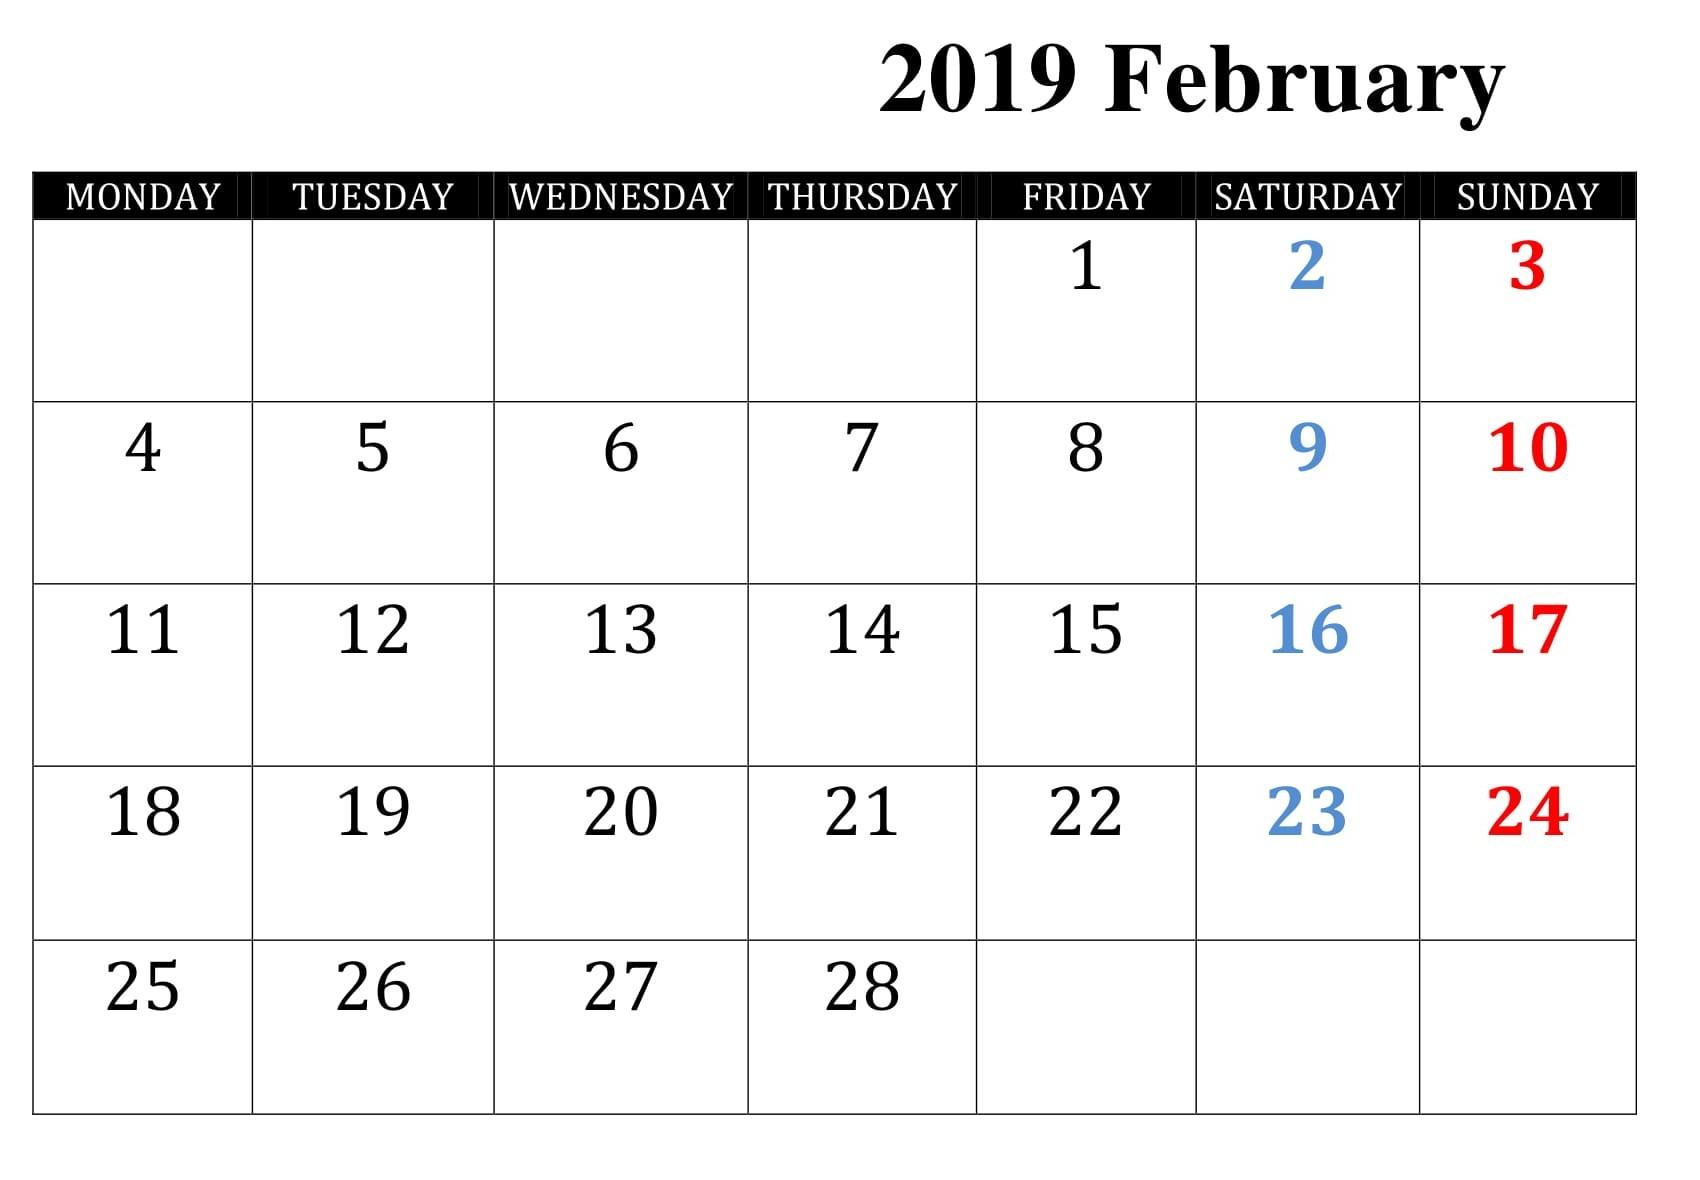 2019 March Calendar Kalnirnay Mejores Y Más Novedosos Editable Calendar February 2019 Lara Expolicenciaslatam Of 2019 March Calendar Kalnirnay Más Arriba-a-fecha Calendar 2019 Raya Cina